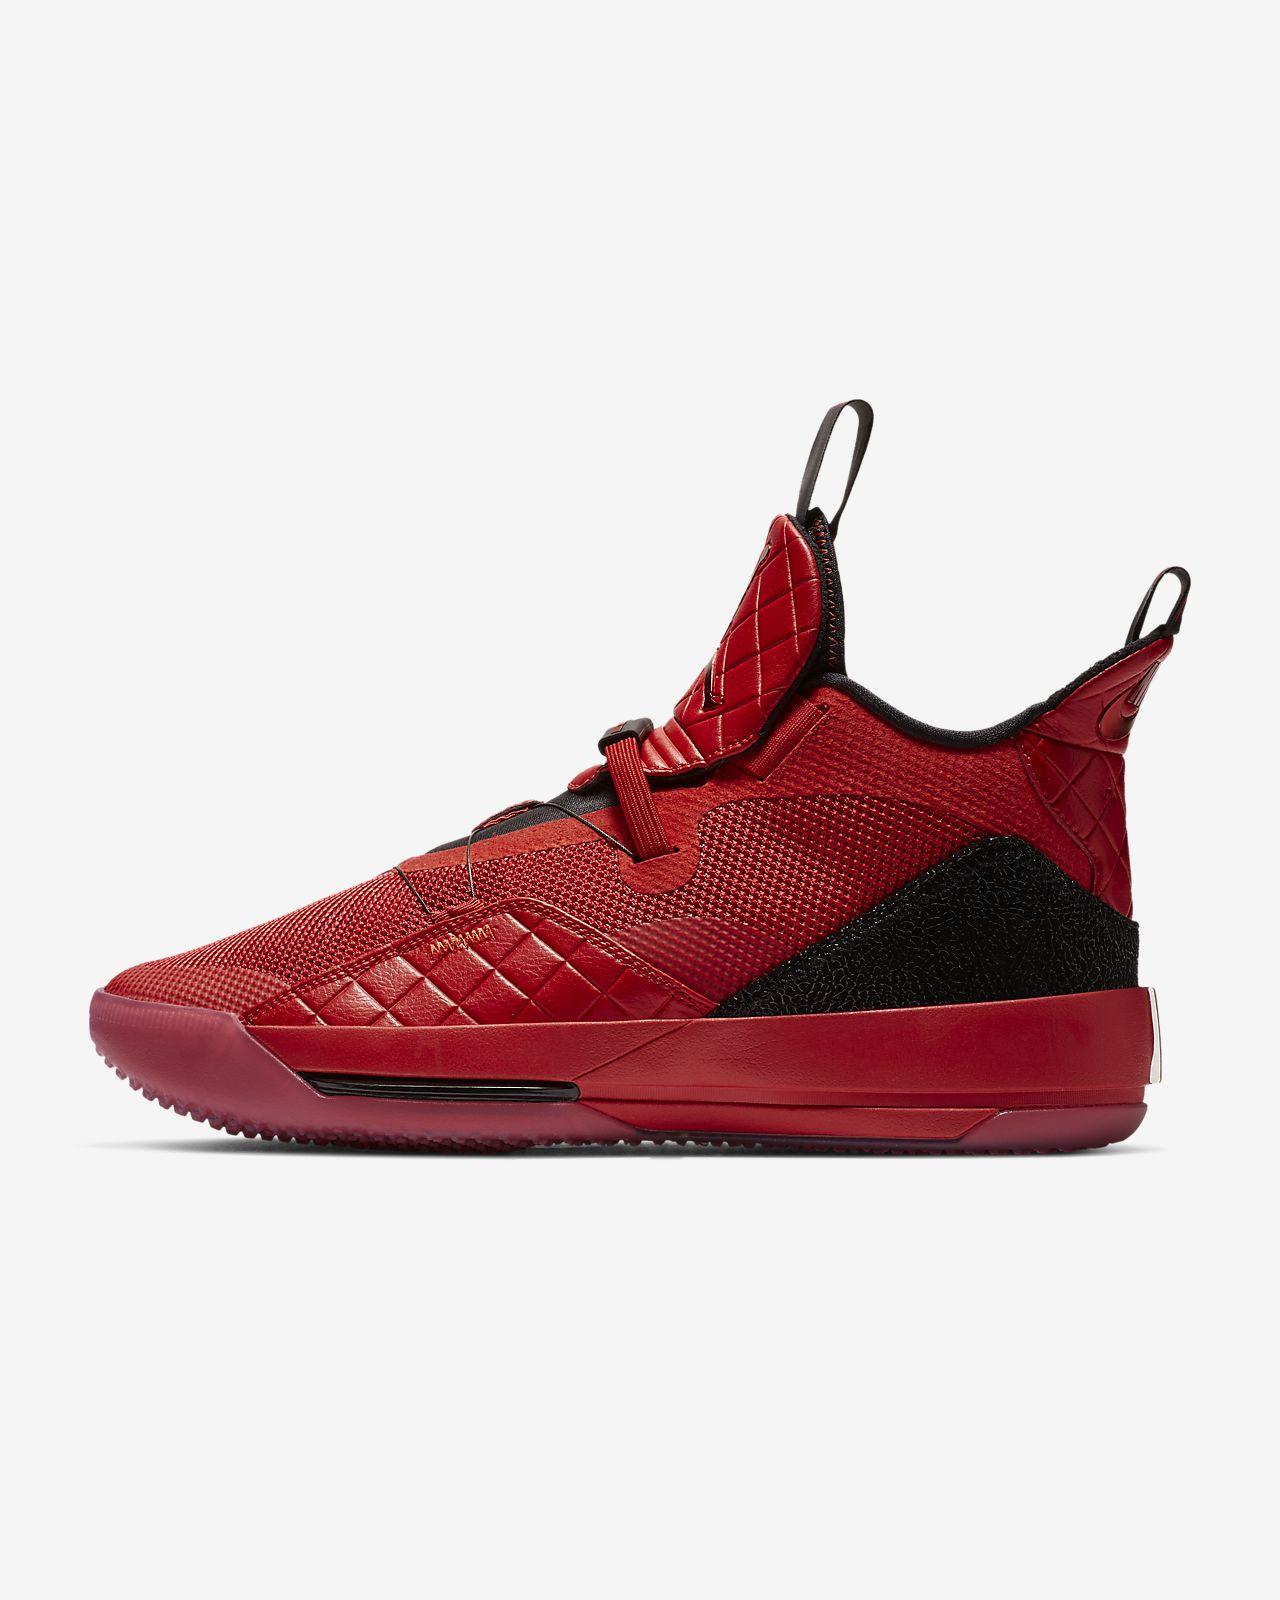 more photos 1299a db807 Low Resolution Air Jordan XXXIII Basketballschuh Air Jordan XXXIII  Basketballschuh